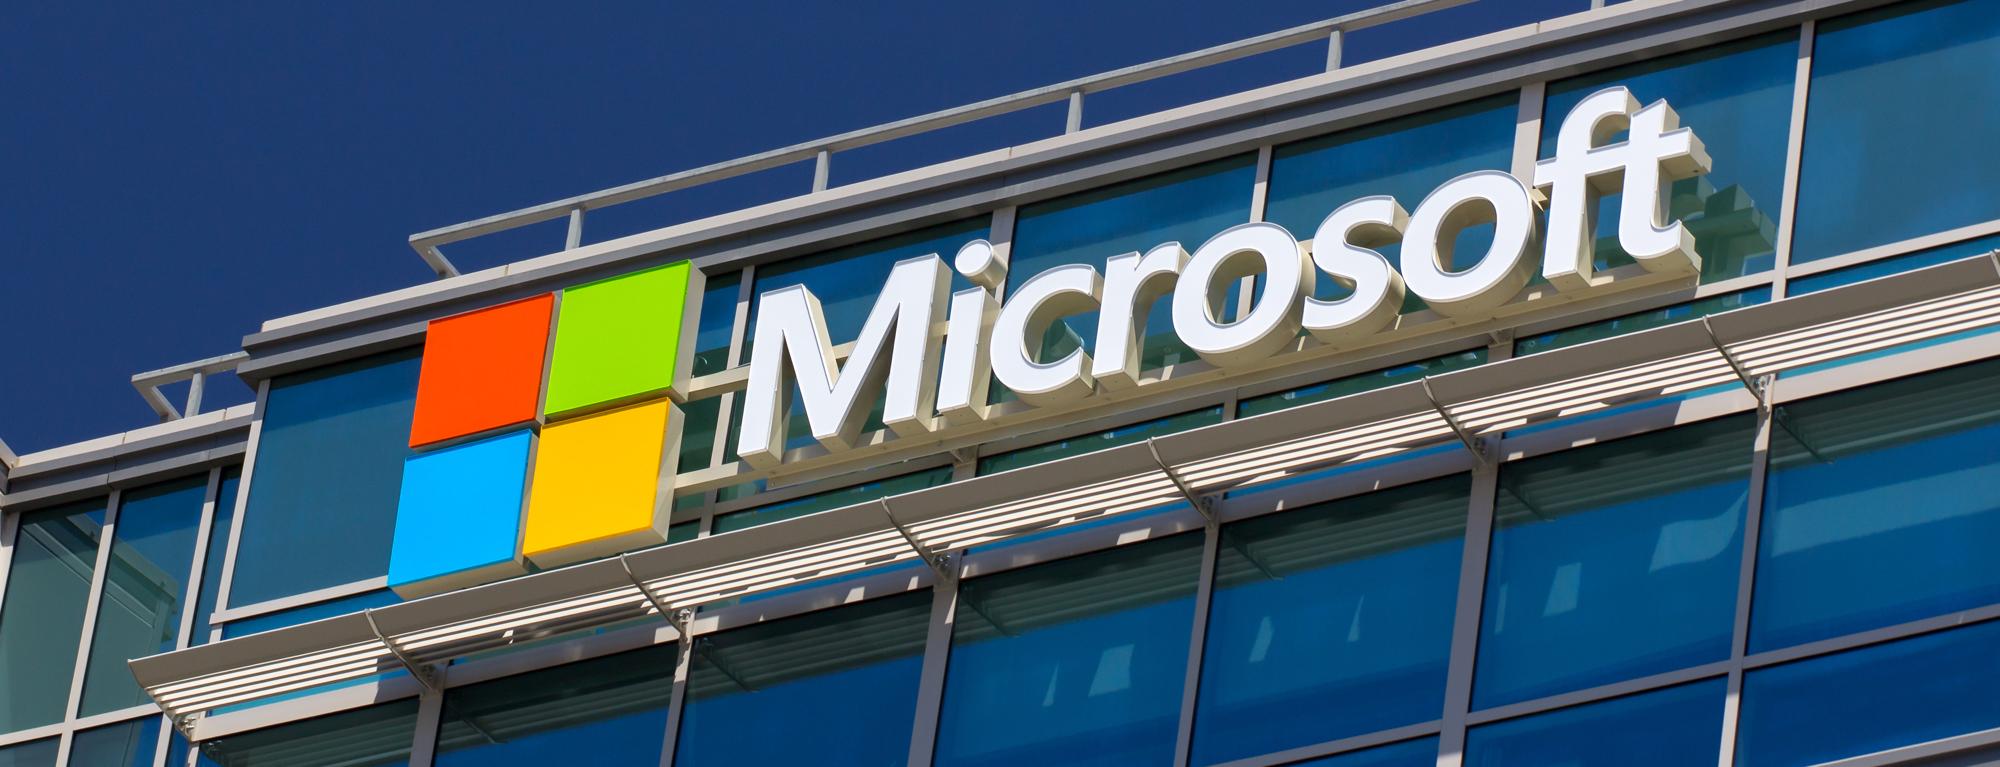 Microsoft Diversity Report: 71% Male, 60.6% Caucasian